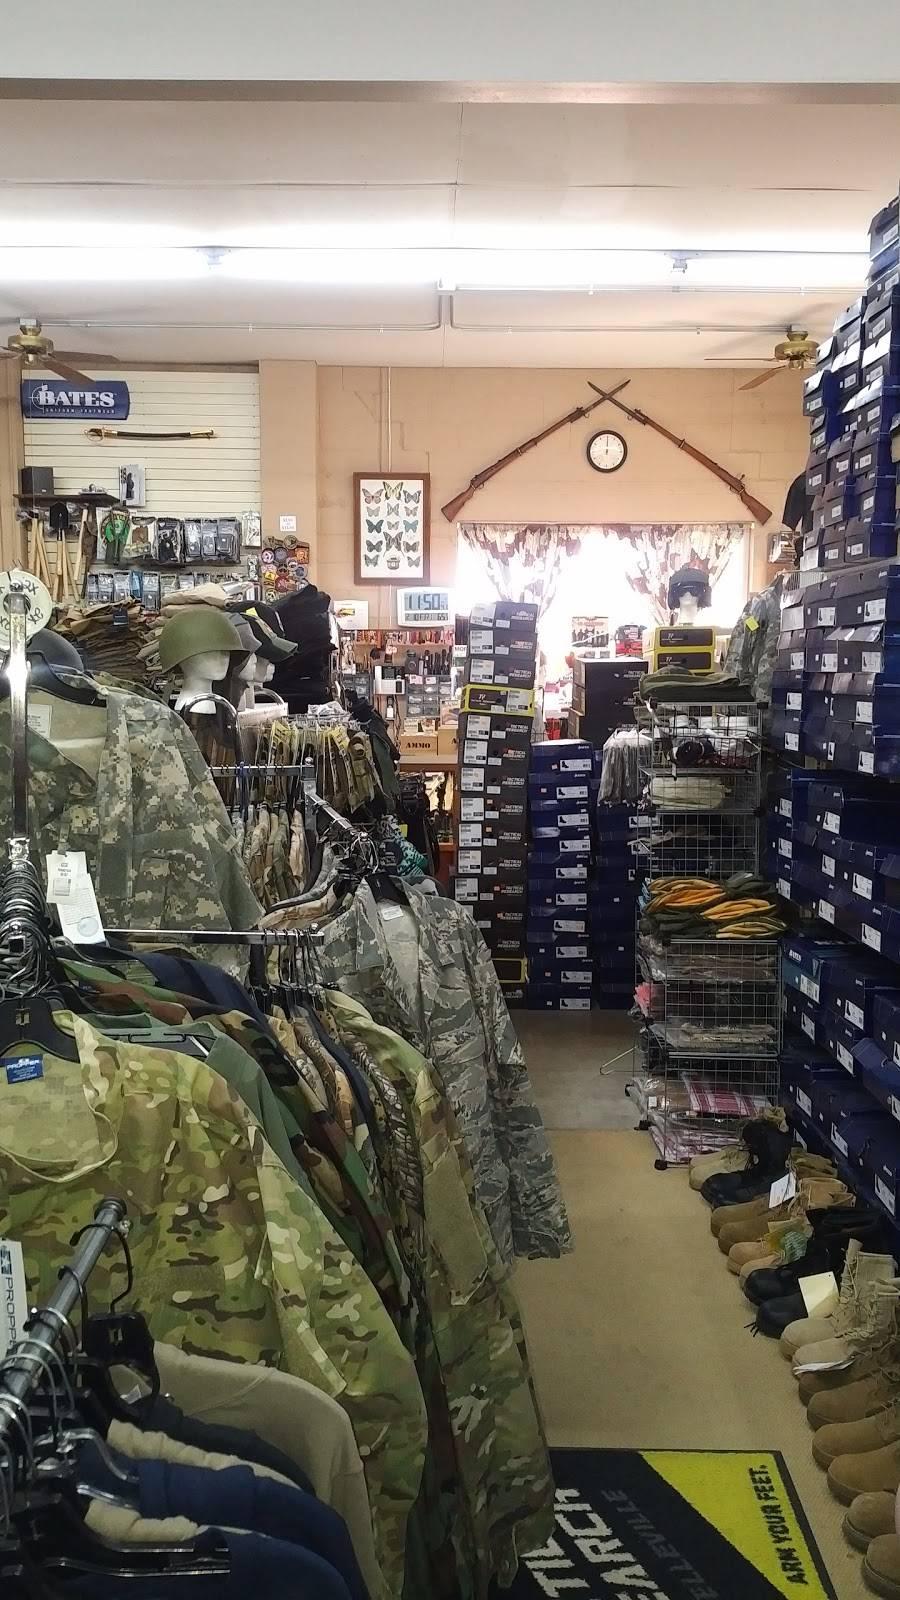 Bosserts Military Surplus - clothing store  | Photo 3 of 7 | Address: 434 NE 32nd St, Kansas City, MO 64116, USA | Phone: (816) 452-2002